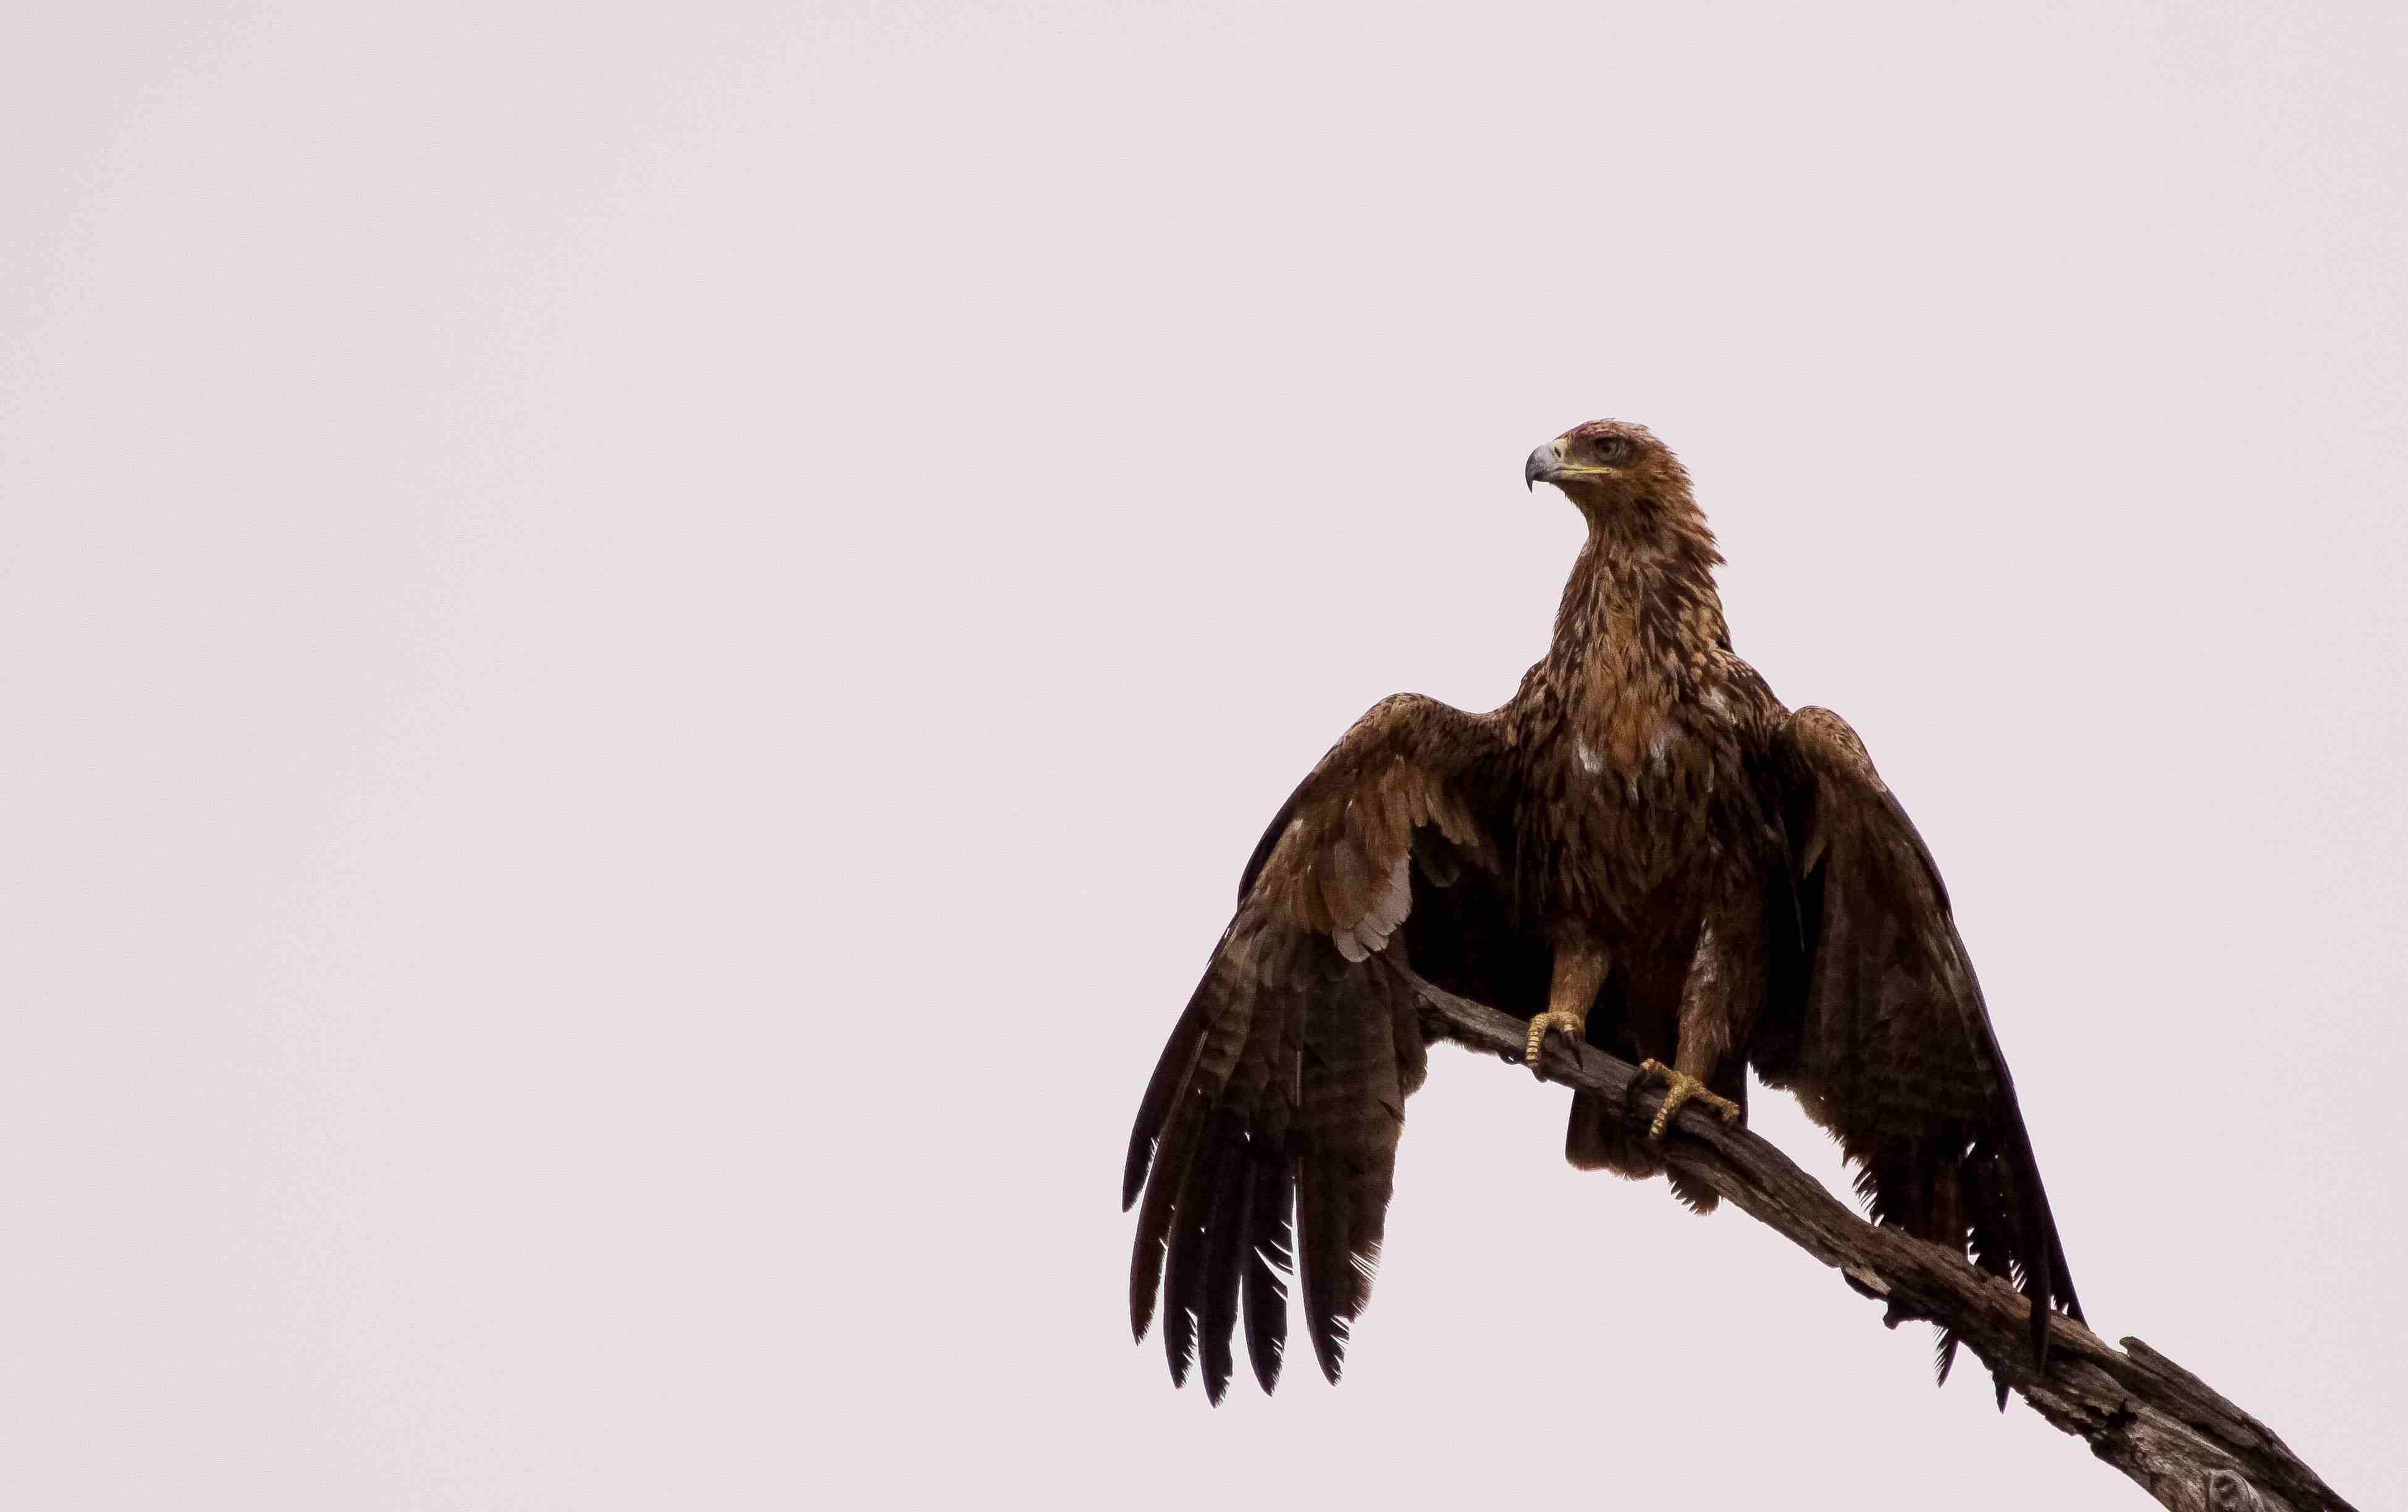 Tawny Eagle against a cloudy sky.